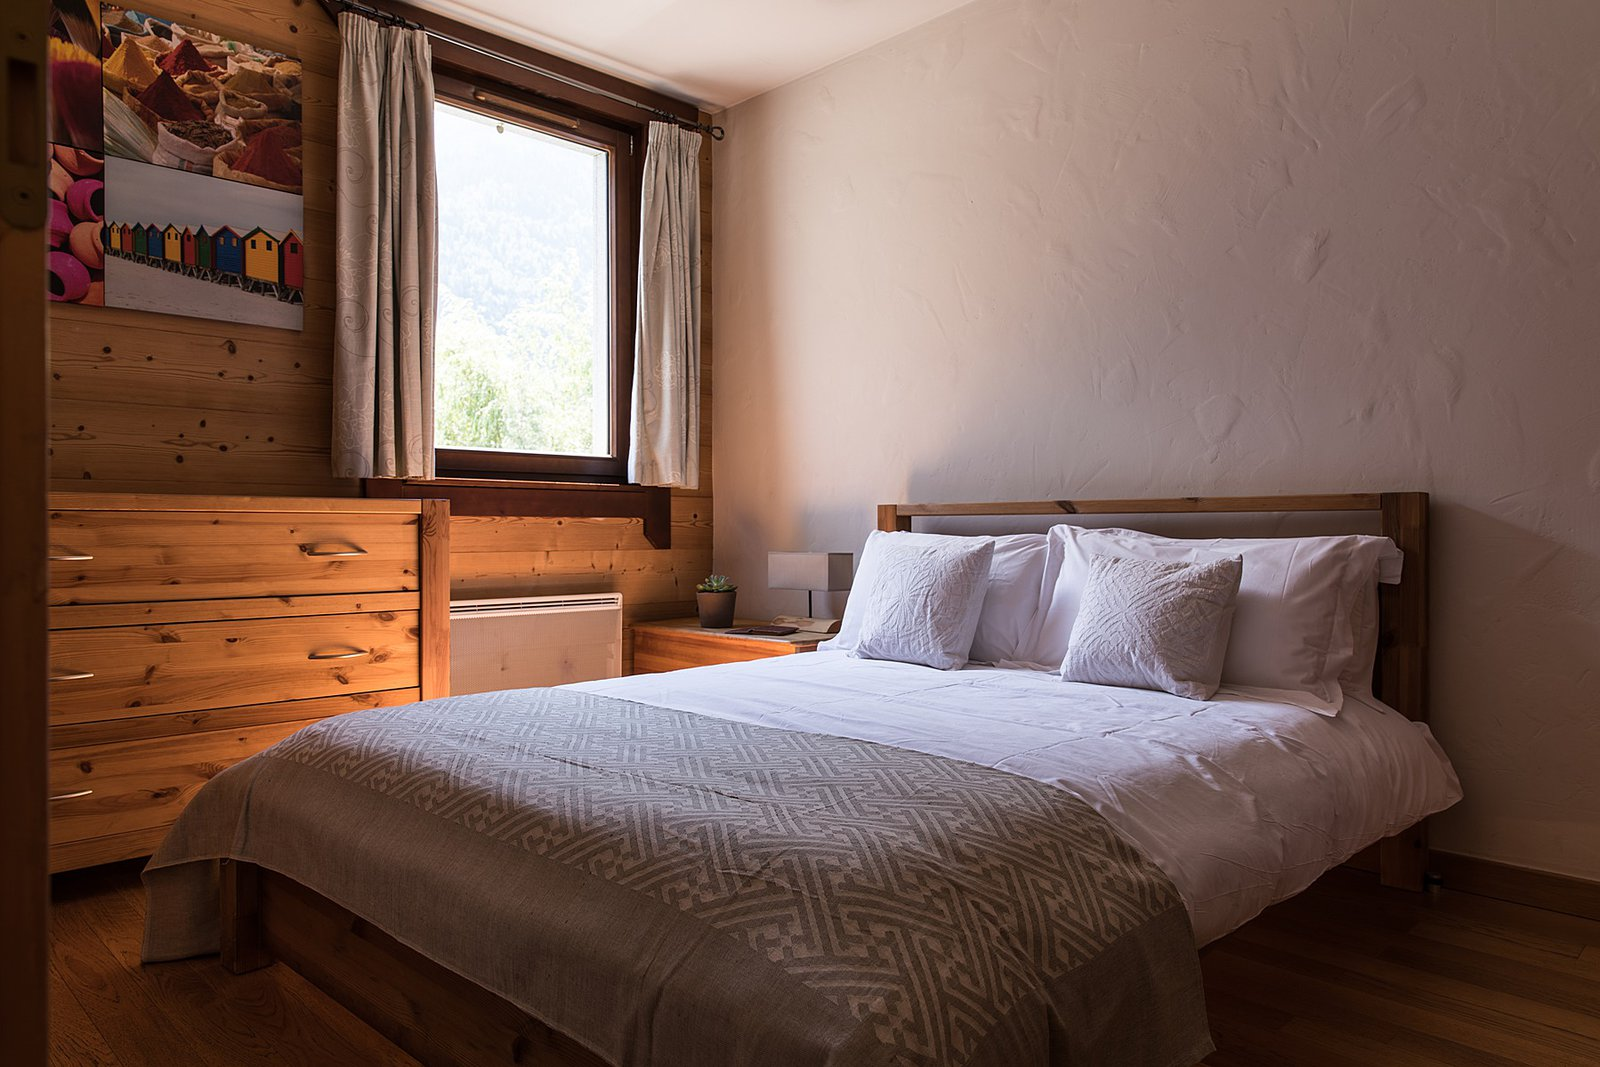 Paradis 2 Apartment, Chamonix: Self-catering accommodation